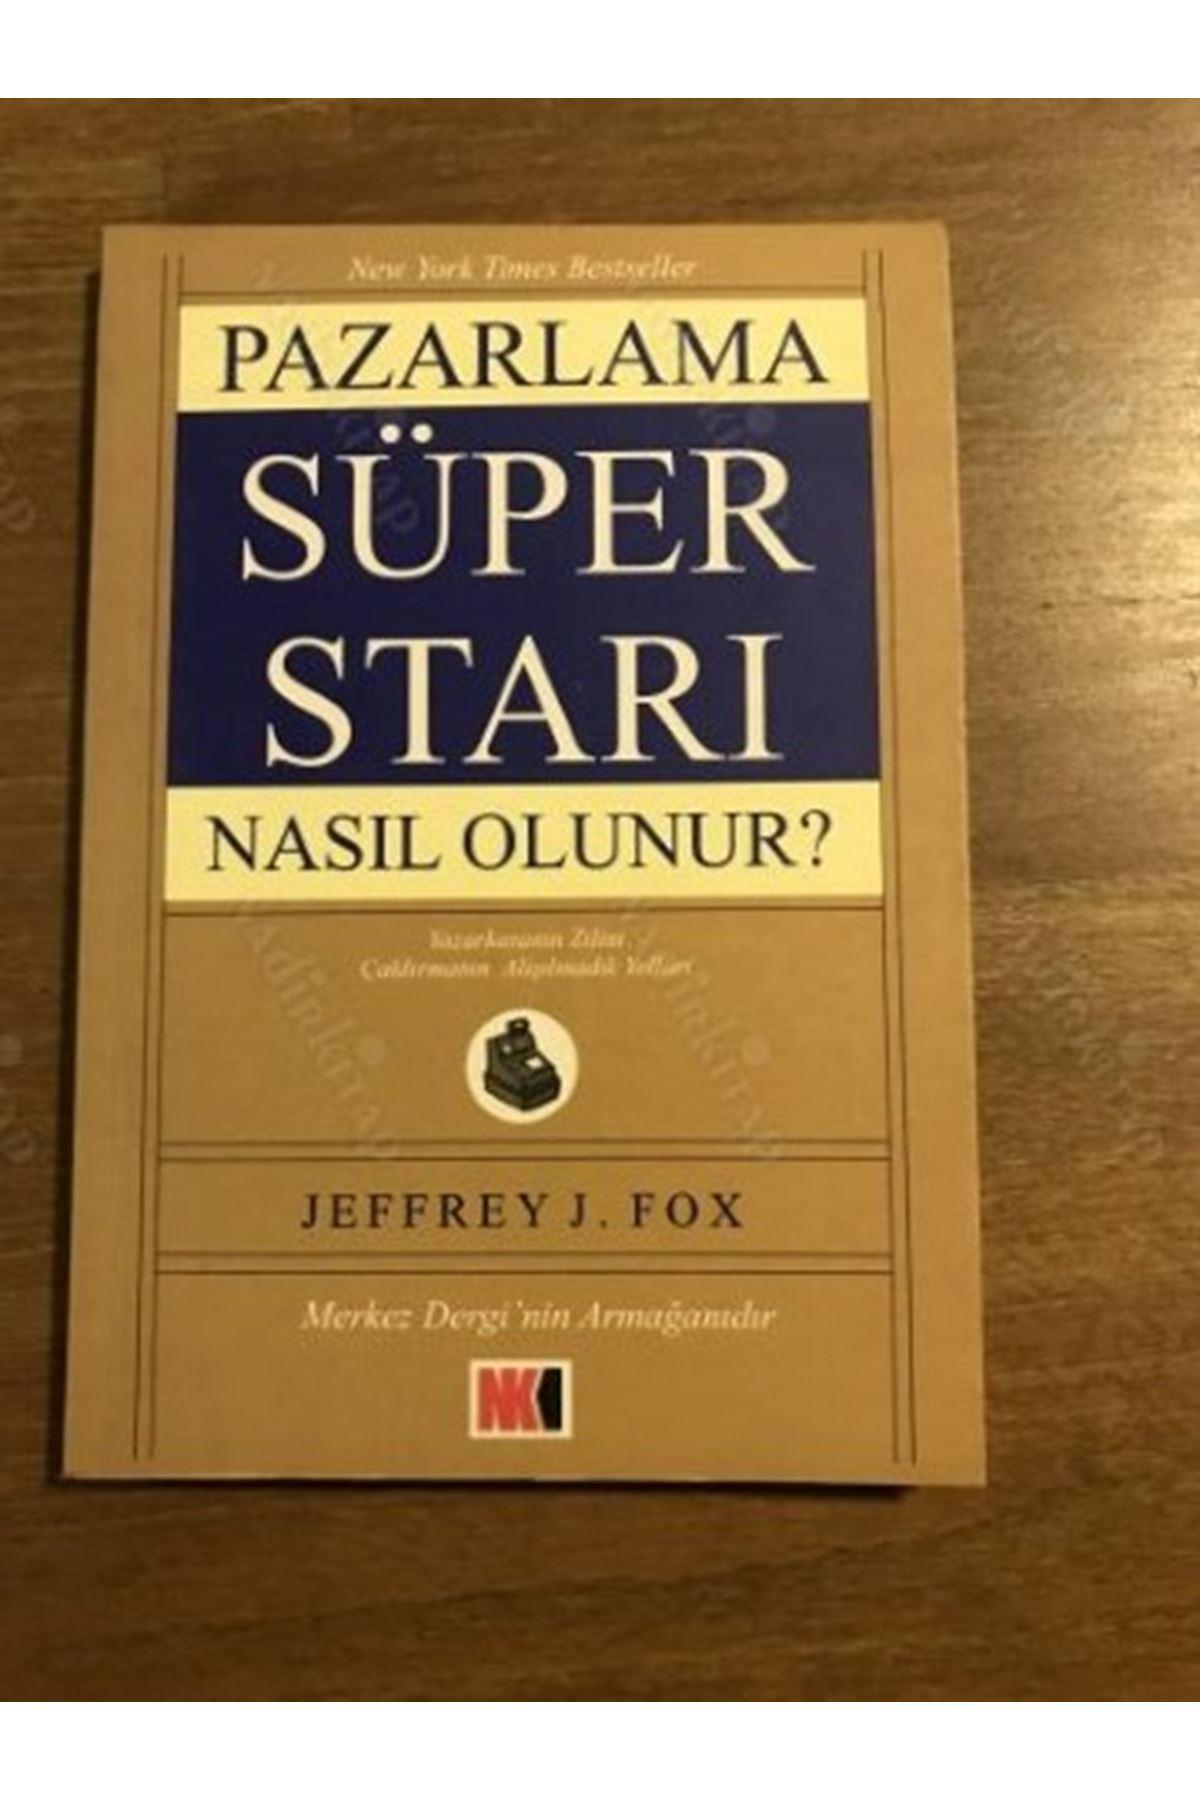 JEFFREY J. FOX - PAZARLAMA SÜPER STARI NASIL OLUNUR